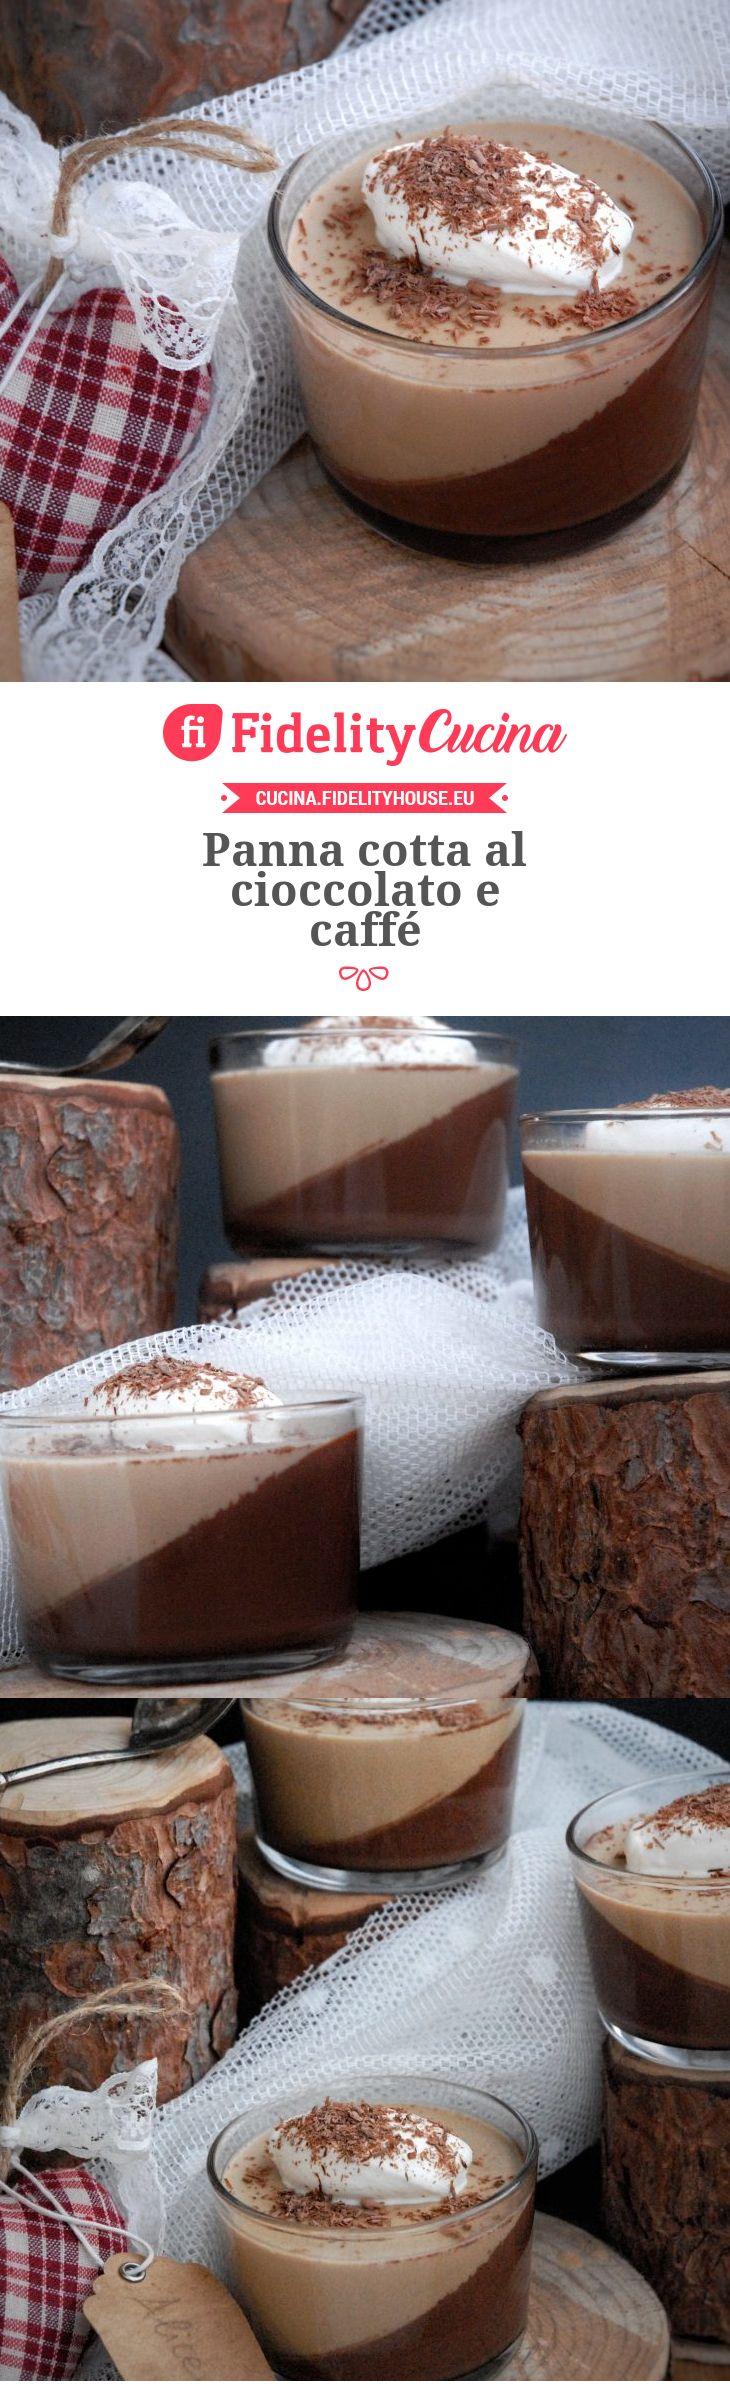 Panna cotta al cioccolato e caffé